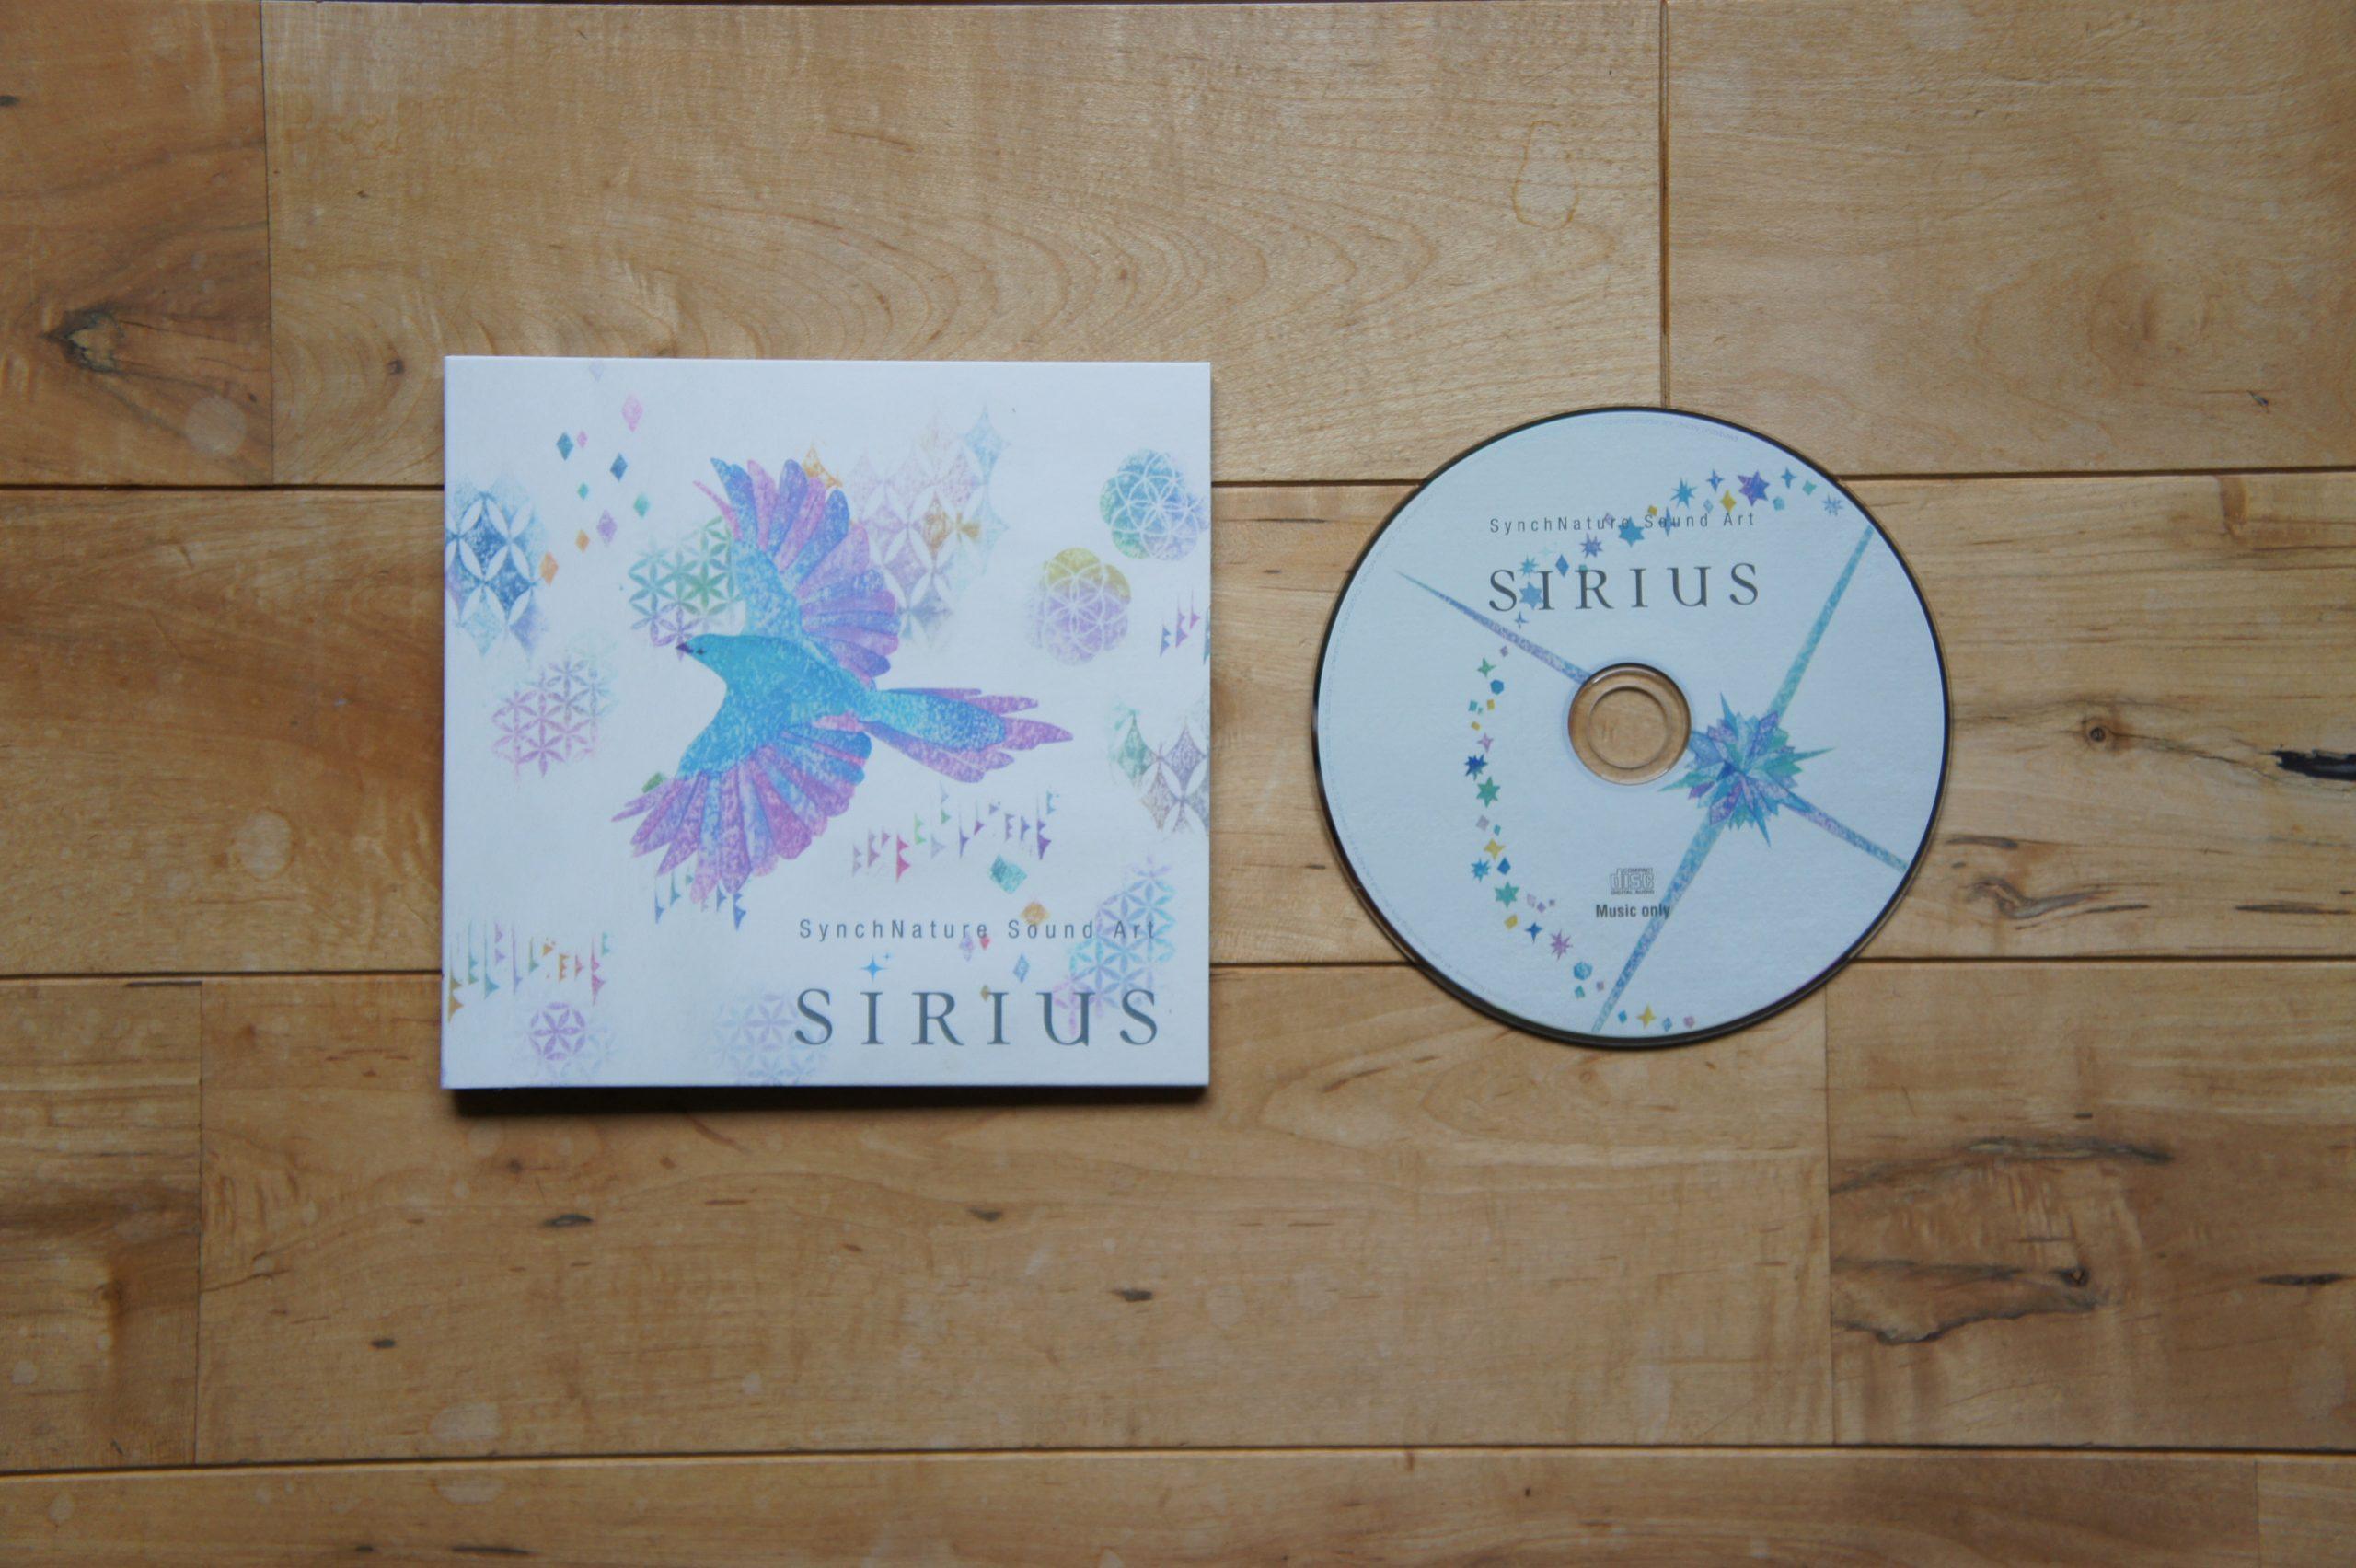 Siriusの応援購入(出資)